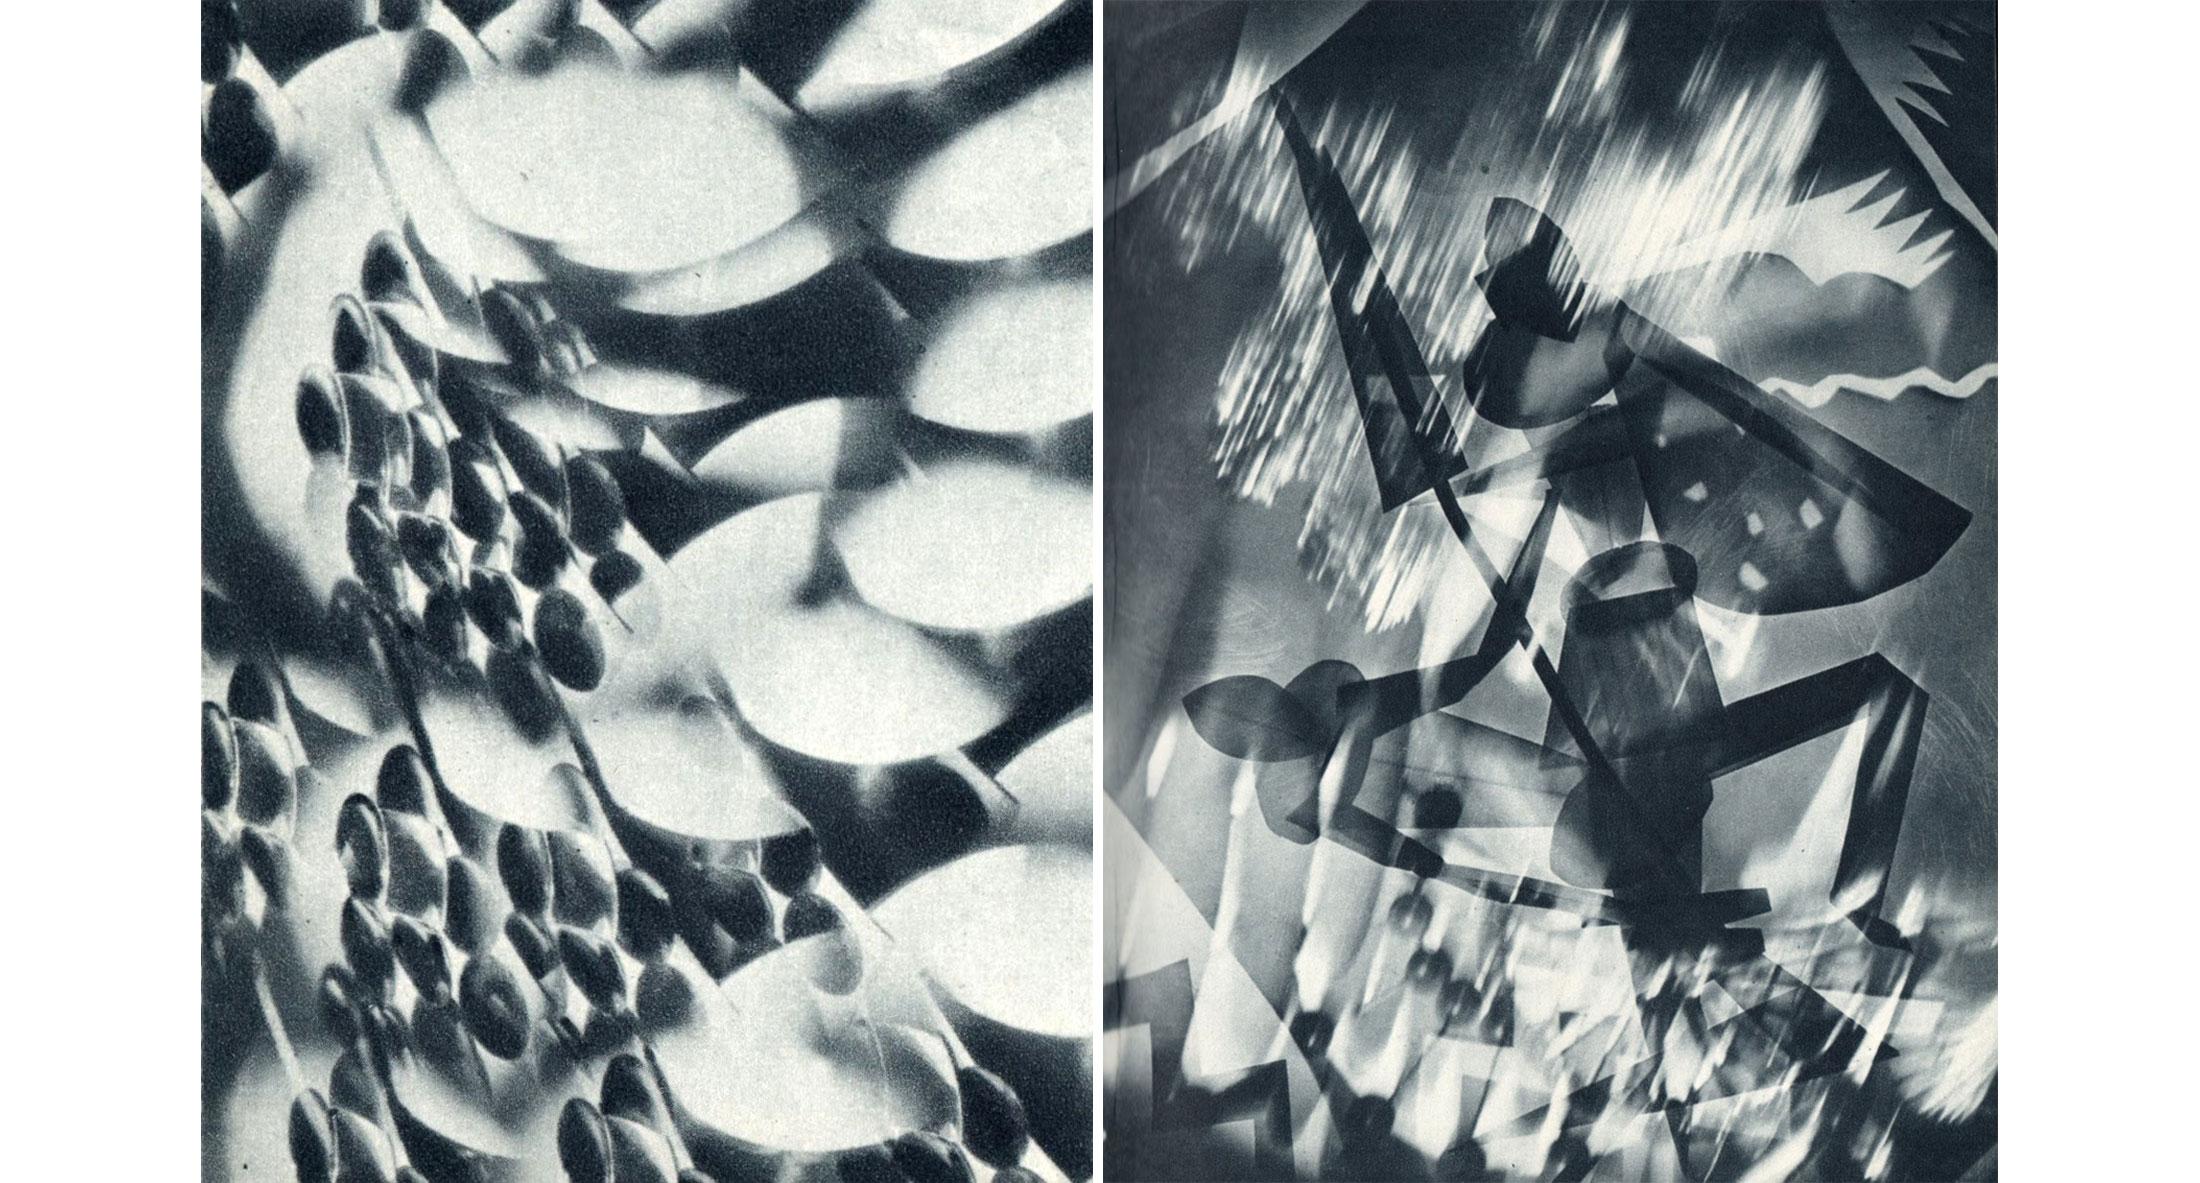 Raymond-Hains-graphisme-et-photographie-magazine-prisma-5-photographie-hypnagogique-03